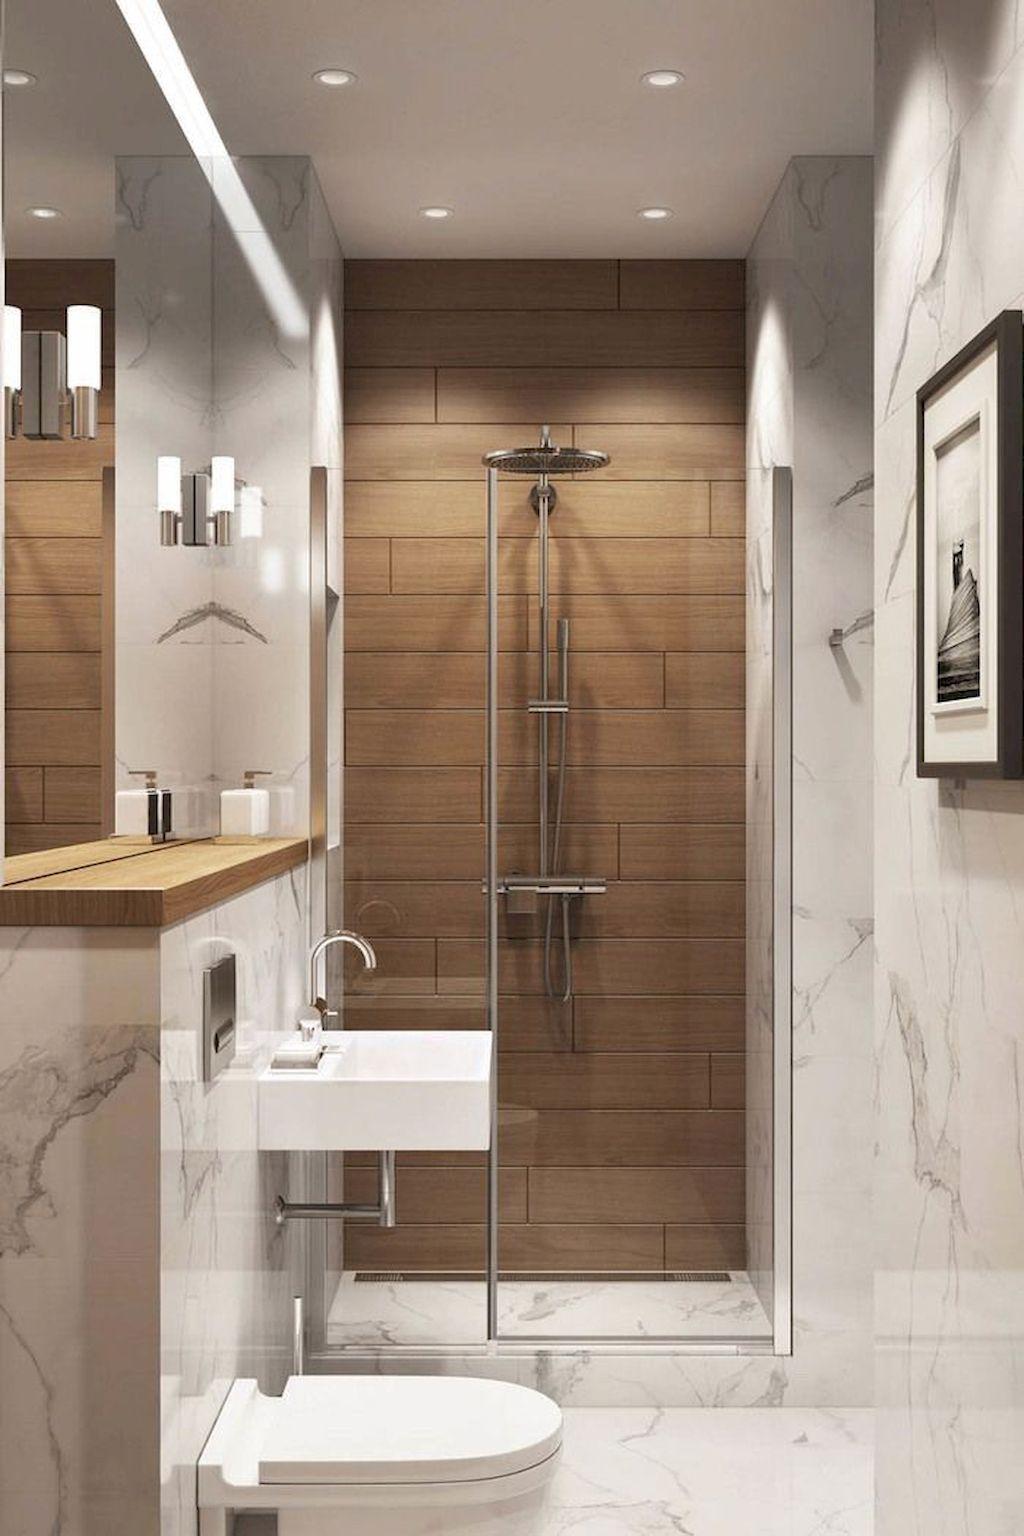 Unusual Bathroom Design Ideas You Need To Know 25